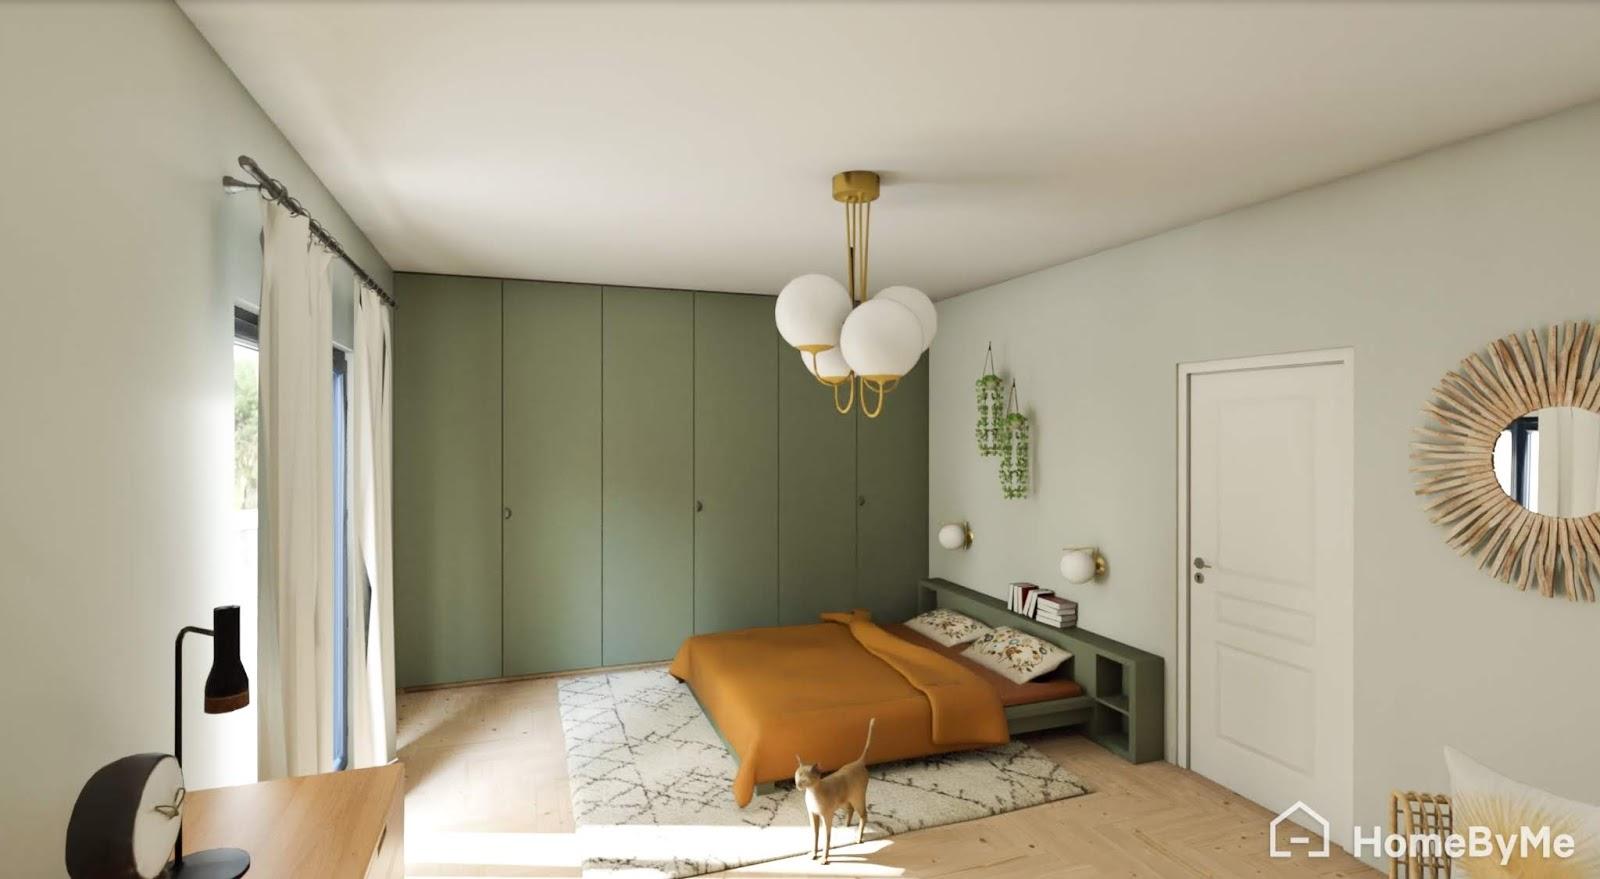 ilaria fatone_home by me_3D chambre à coucher